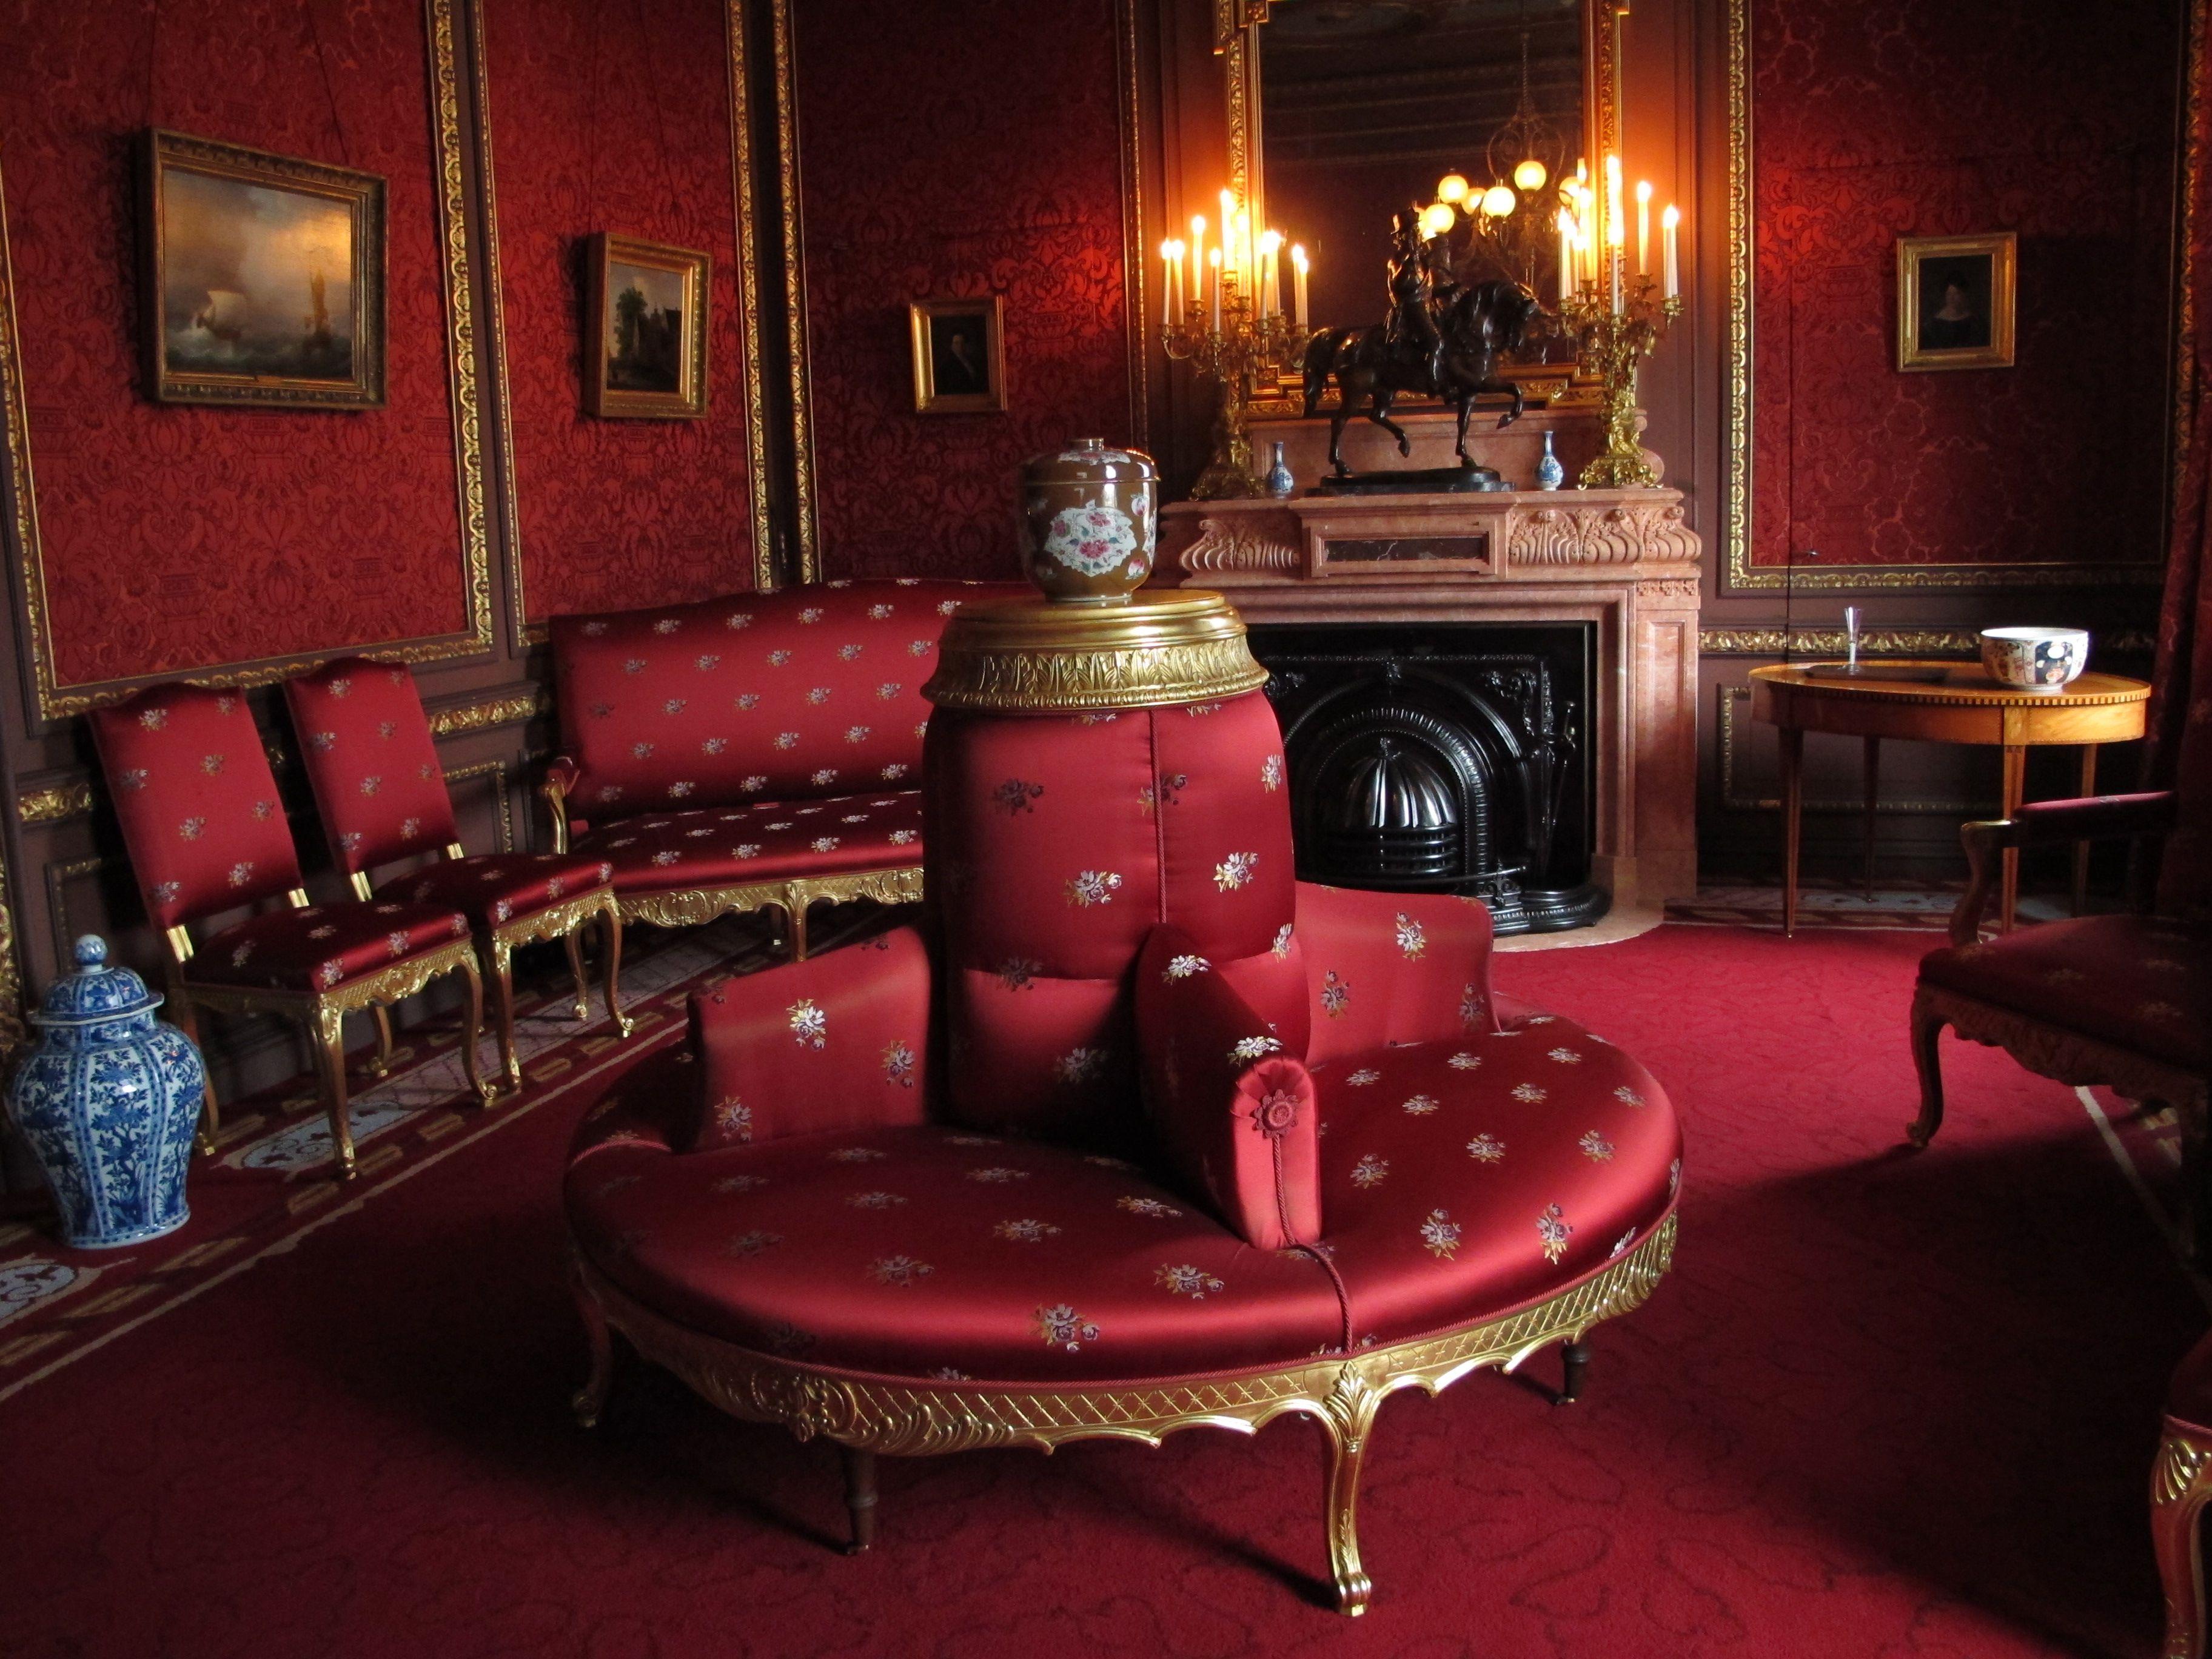 Rode slaapkamer. top free slaapkamer verven welke kleur spscentscom